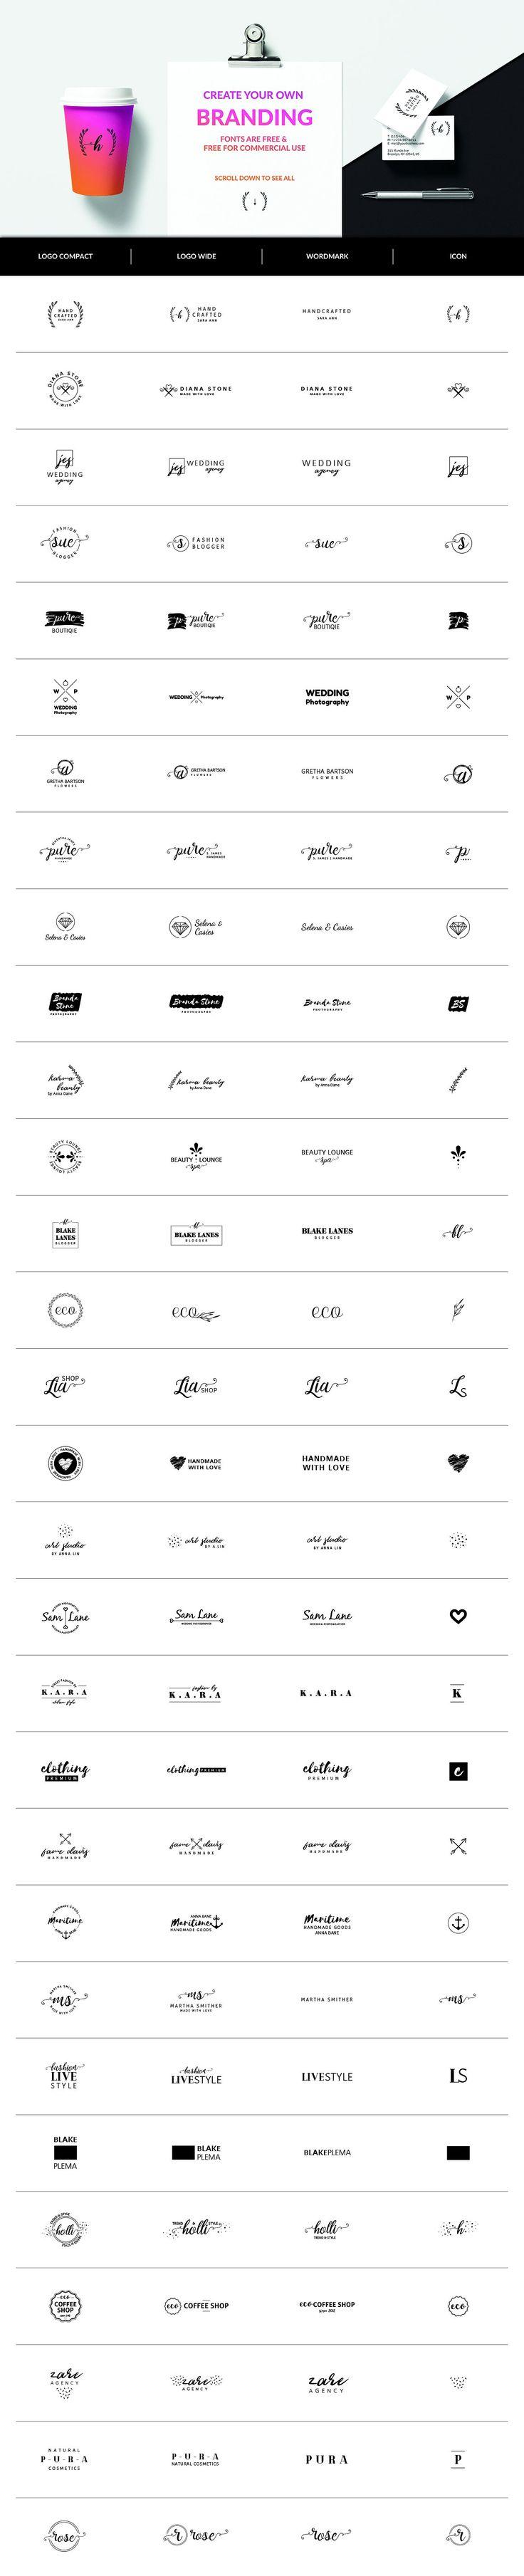 30 Premade Logos – Feminine Edition by AgataCreate on @creativemarket #BADGE #LABEL #LOGO #LOGOS #BLACK #JETBLACK #MINIMAL #ELEGANT #READY #TO #USE #PREMIUM #RETRO #VINTAGE #FEMININE #MASCULINE #TYPOGRAPHY #TYPO #KIT #HIPSTER #WOMAN #LADY #beauty #BRAND #BRANDING #feminine #CIRCLE #DECORATIVE# CORPORATE #DESIGN #CORPORATE #DESIGN #FASHION #BUNDLE #SET #BLOG #BLOGGER #EDITABLE #READY #USE #PREMADE #PRINT #MINIMALISTIC #leaf #leavs #MODERN #diy #ILLUSTRATOR #PHOTOSHOP #gradient #sewing #spa